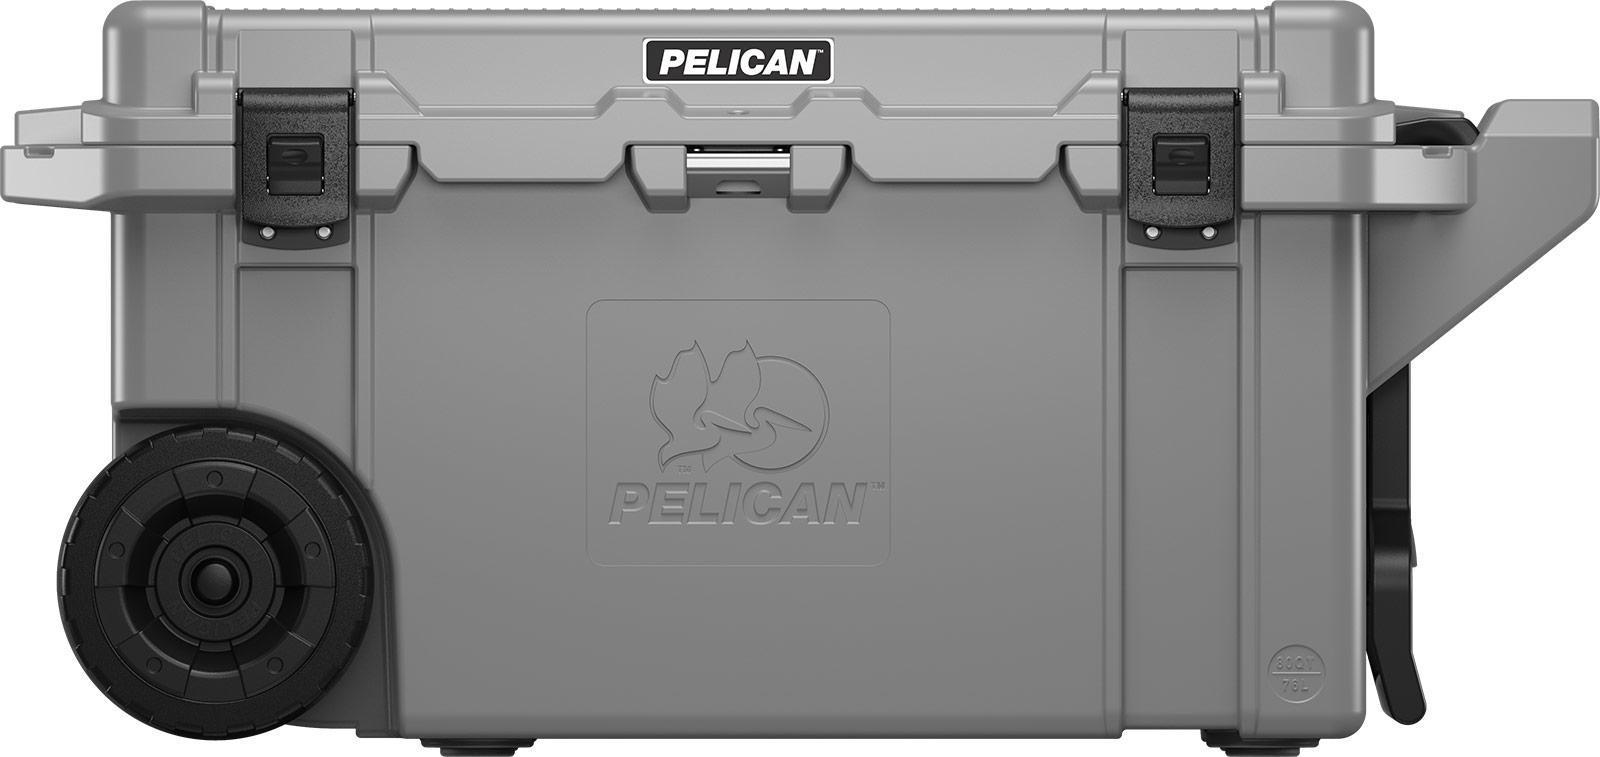 pelican 80qt cooler gray wheeled coolers